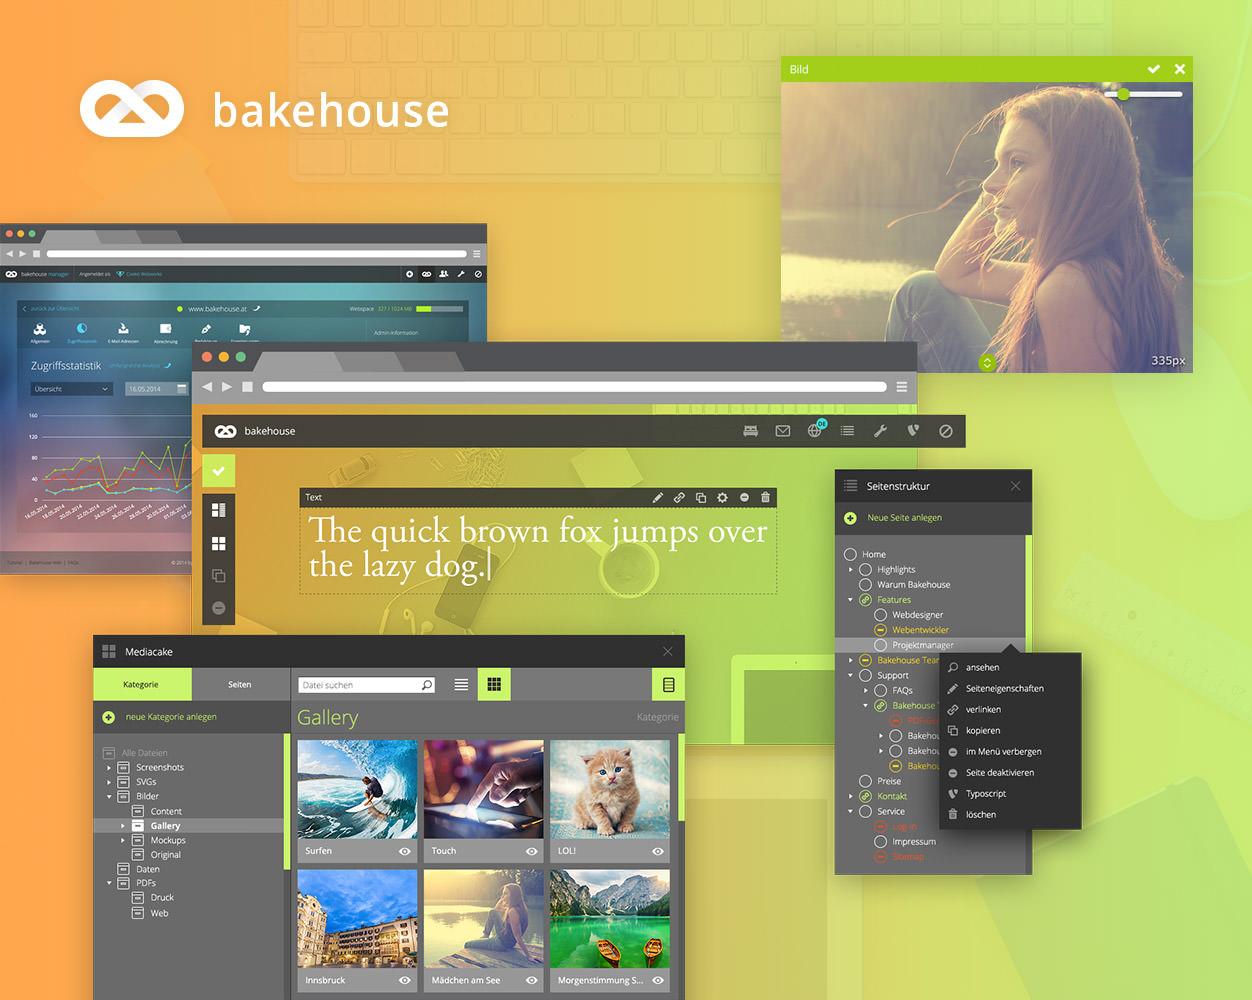 IPhoneBlog Backhouse